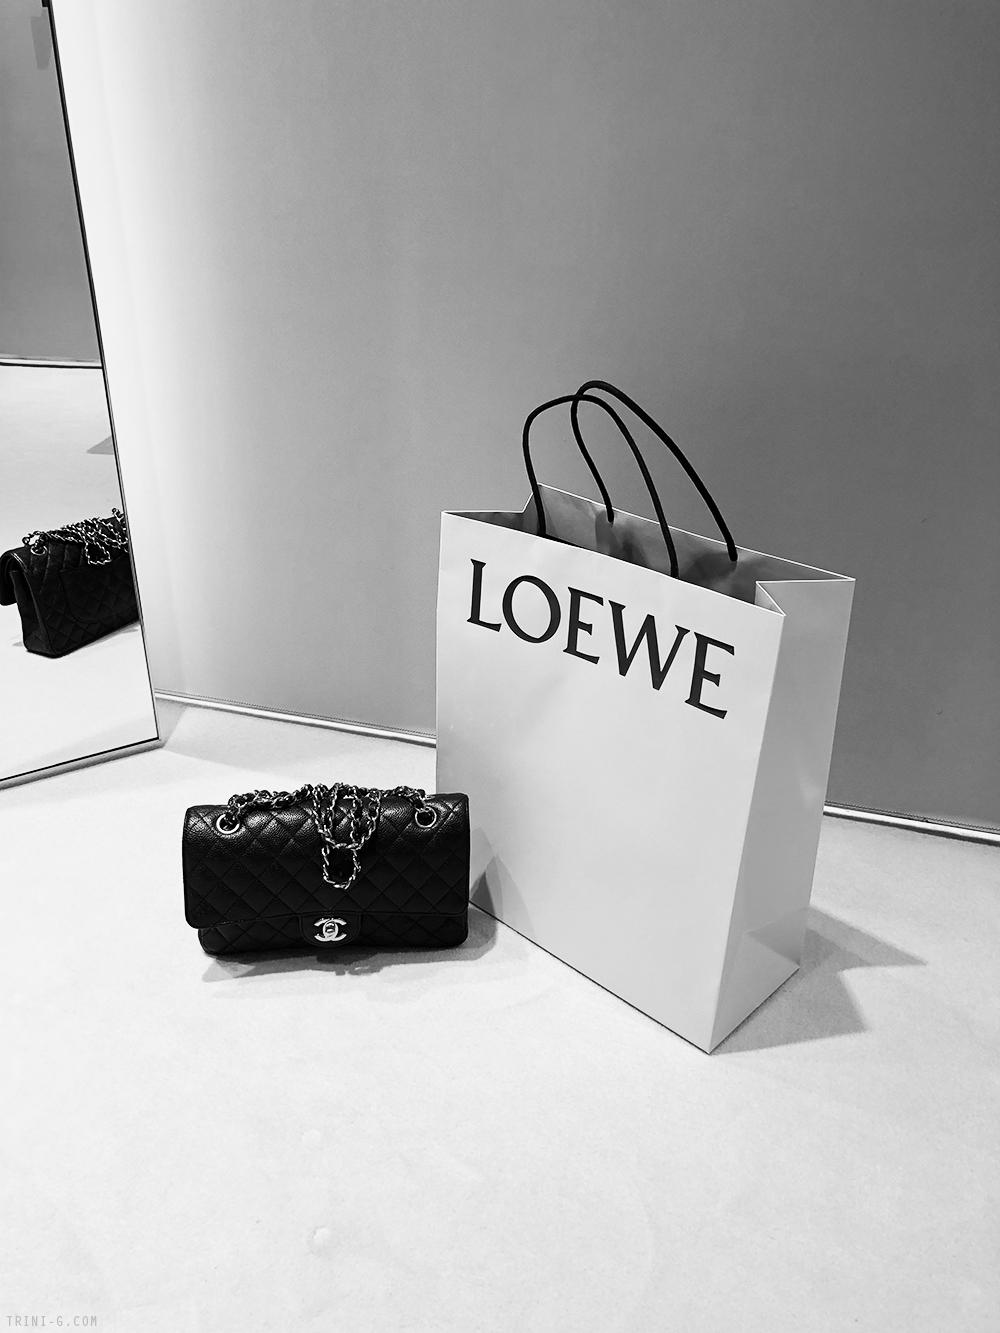 Trini |Chanel classic flap bag Loewe bag